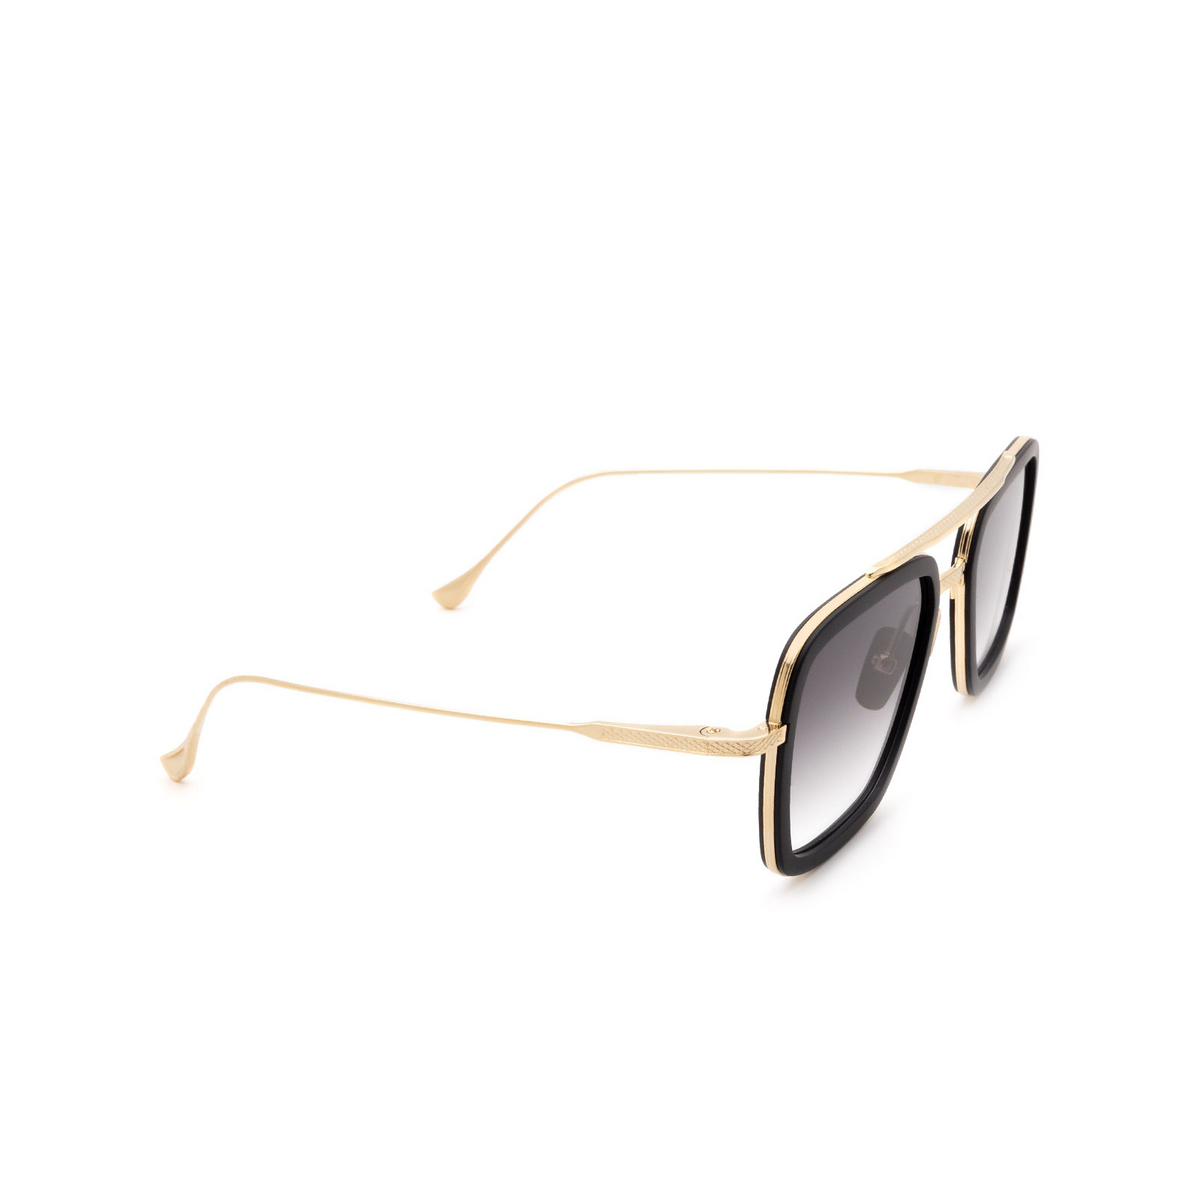 Dita® Aviator Sunglasses: Flight.006 7806-B color Black & Gold Blk-gld.